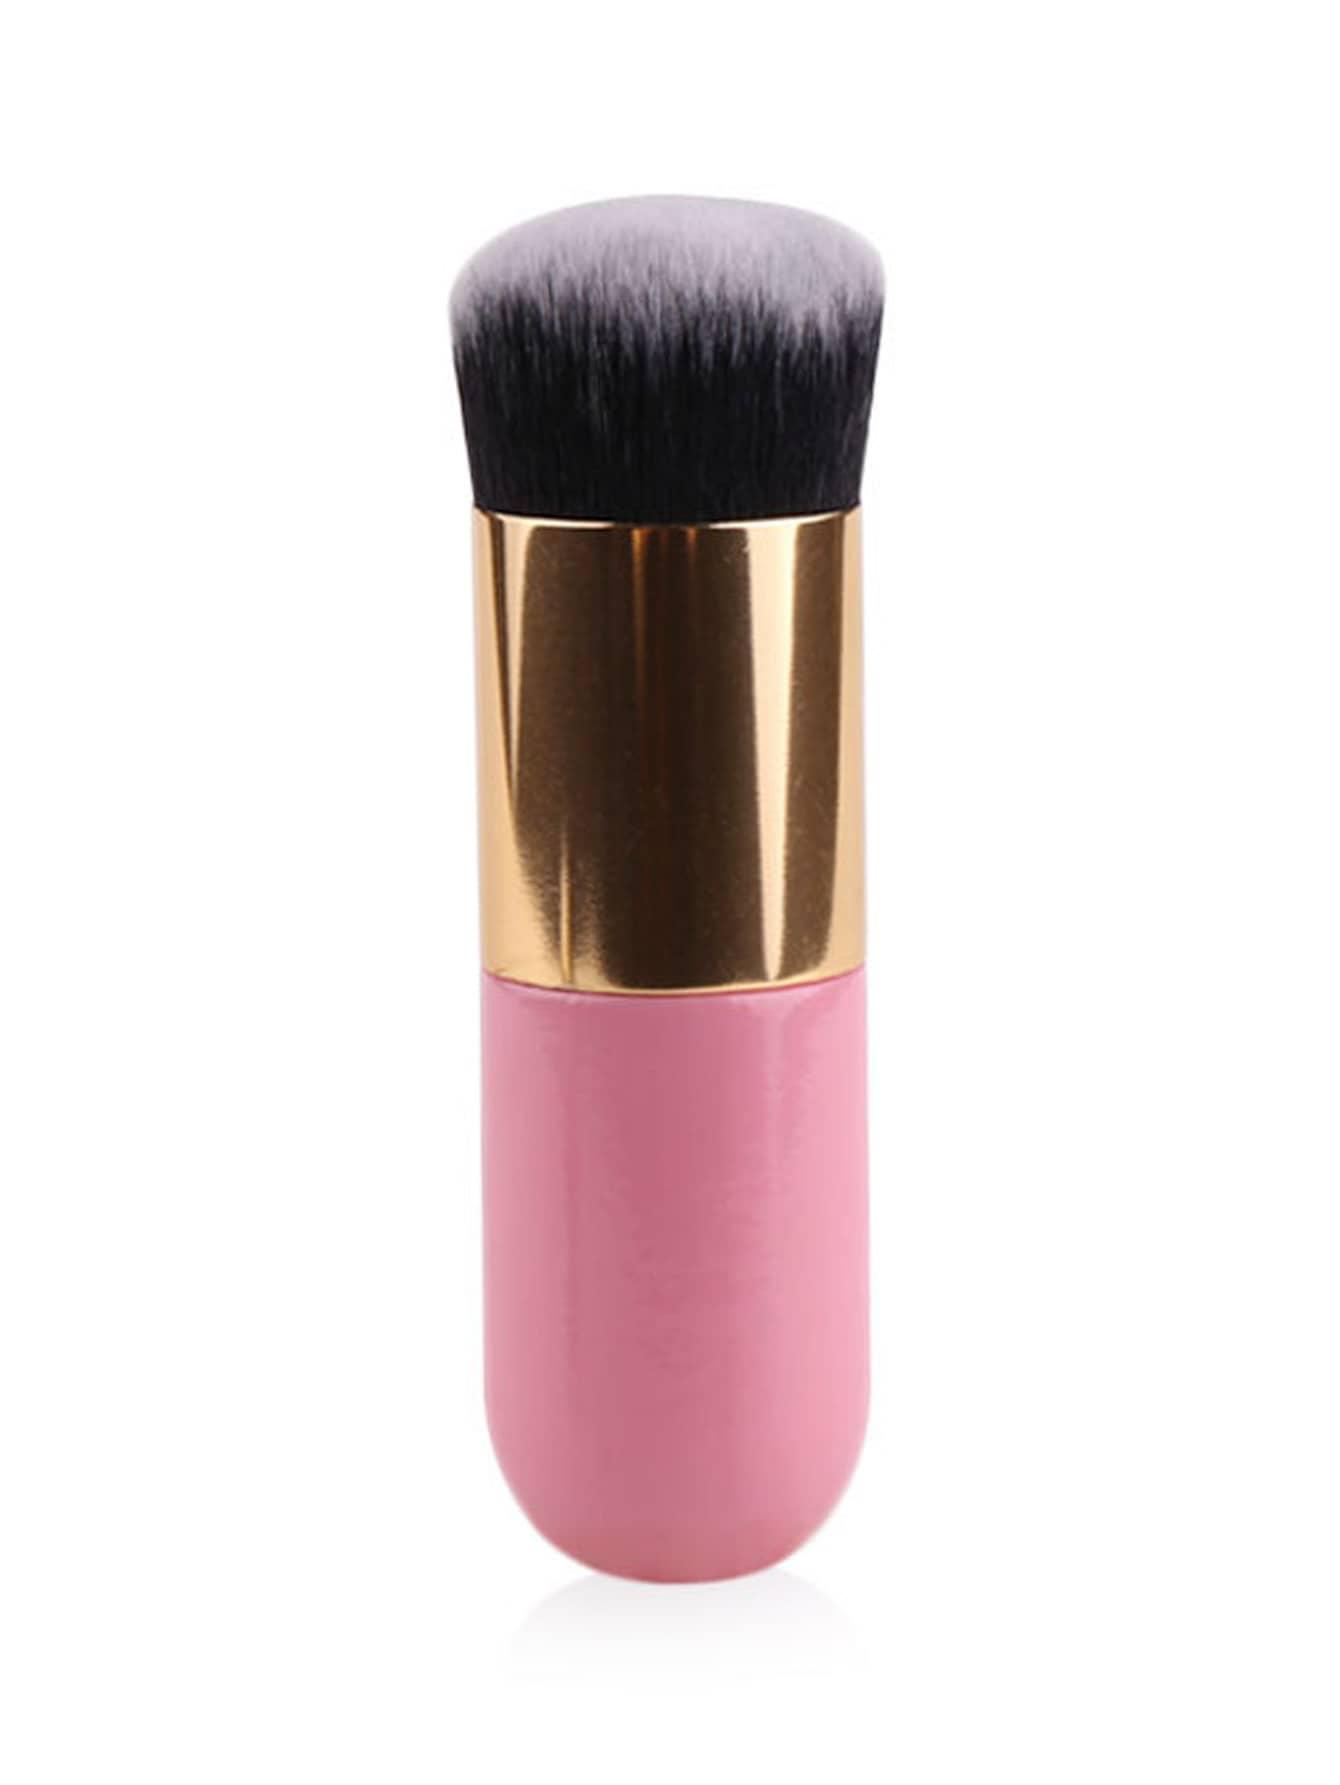 Contrast Bristle Chunky Makeup Brush